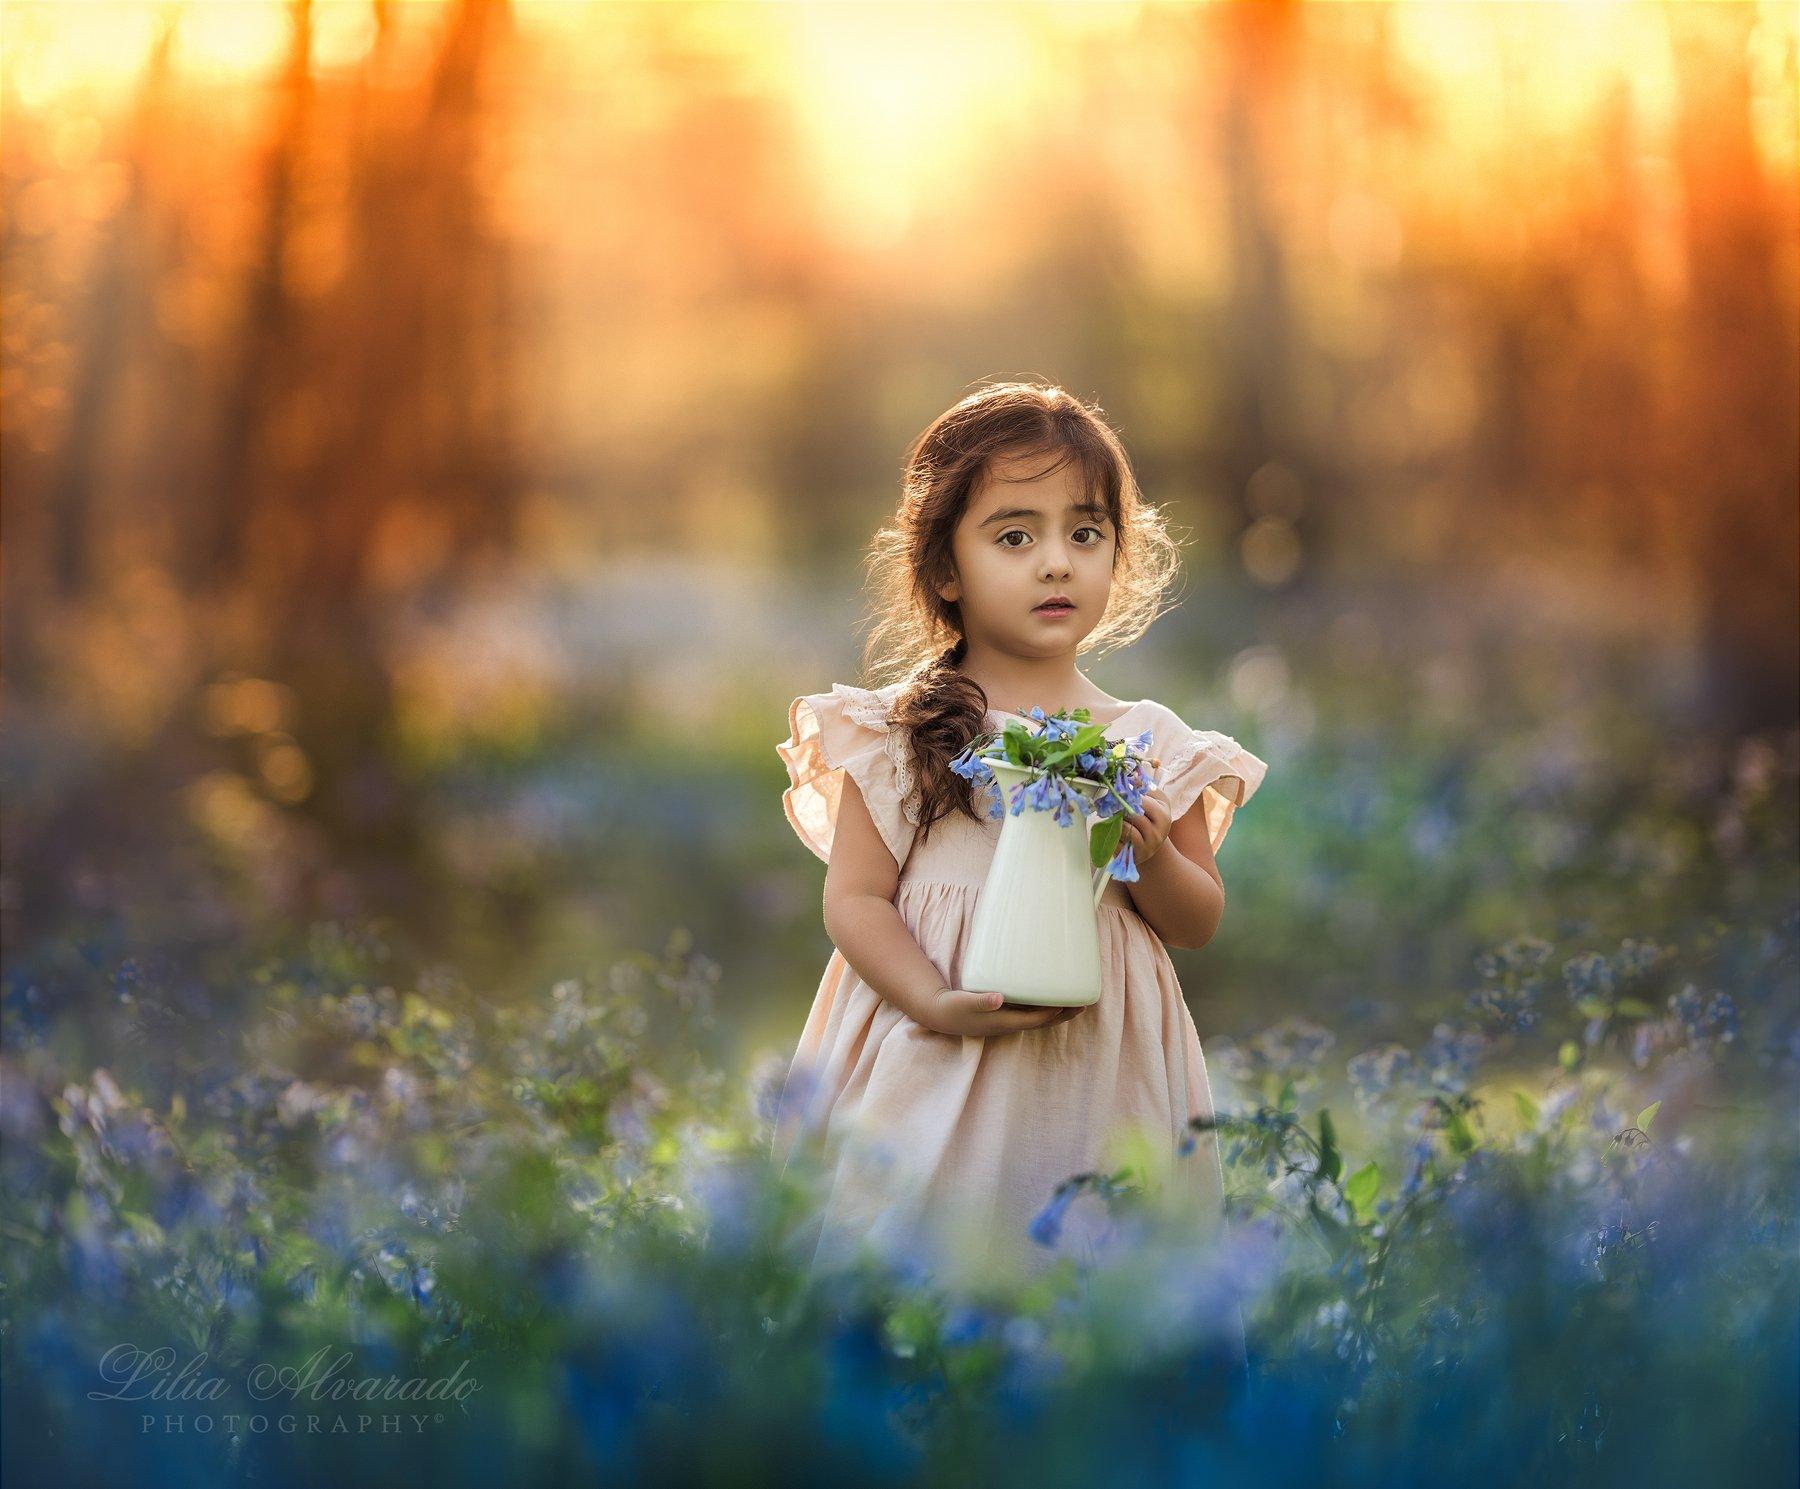 canon,200mm,flowers,forest,spring,childhood,golden,natural,light,hour,brunette, Lilia Alvarado